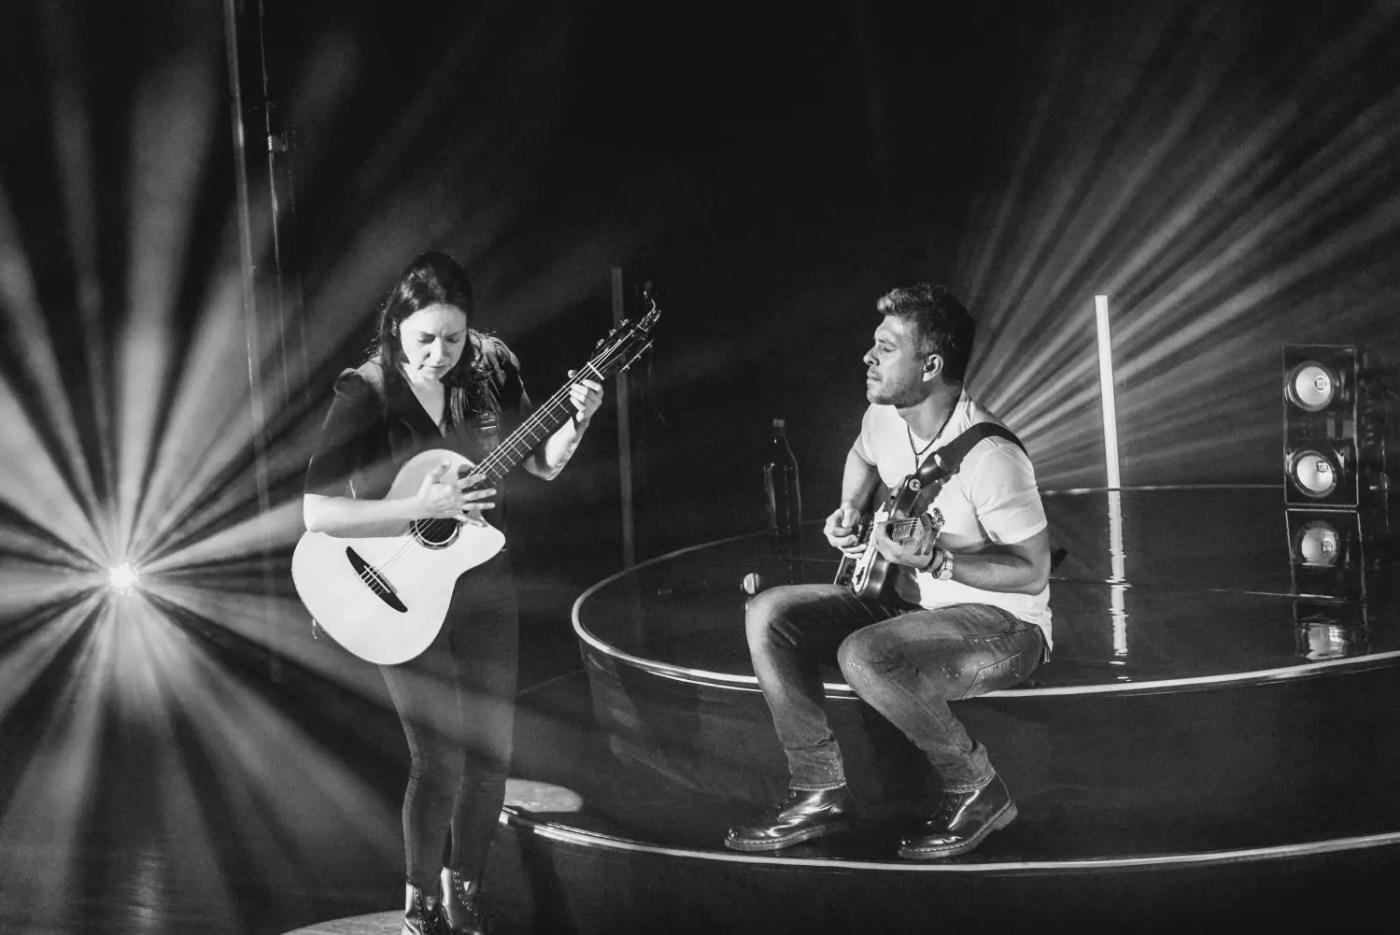 Rodrigo y Gabriela: Ryman Auditorium | Photos | LIVING LIFE FEARLESS